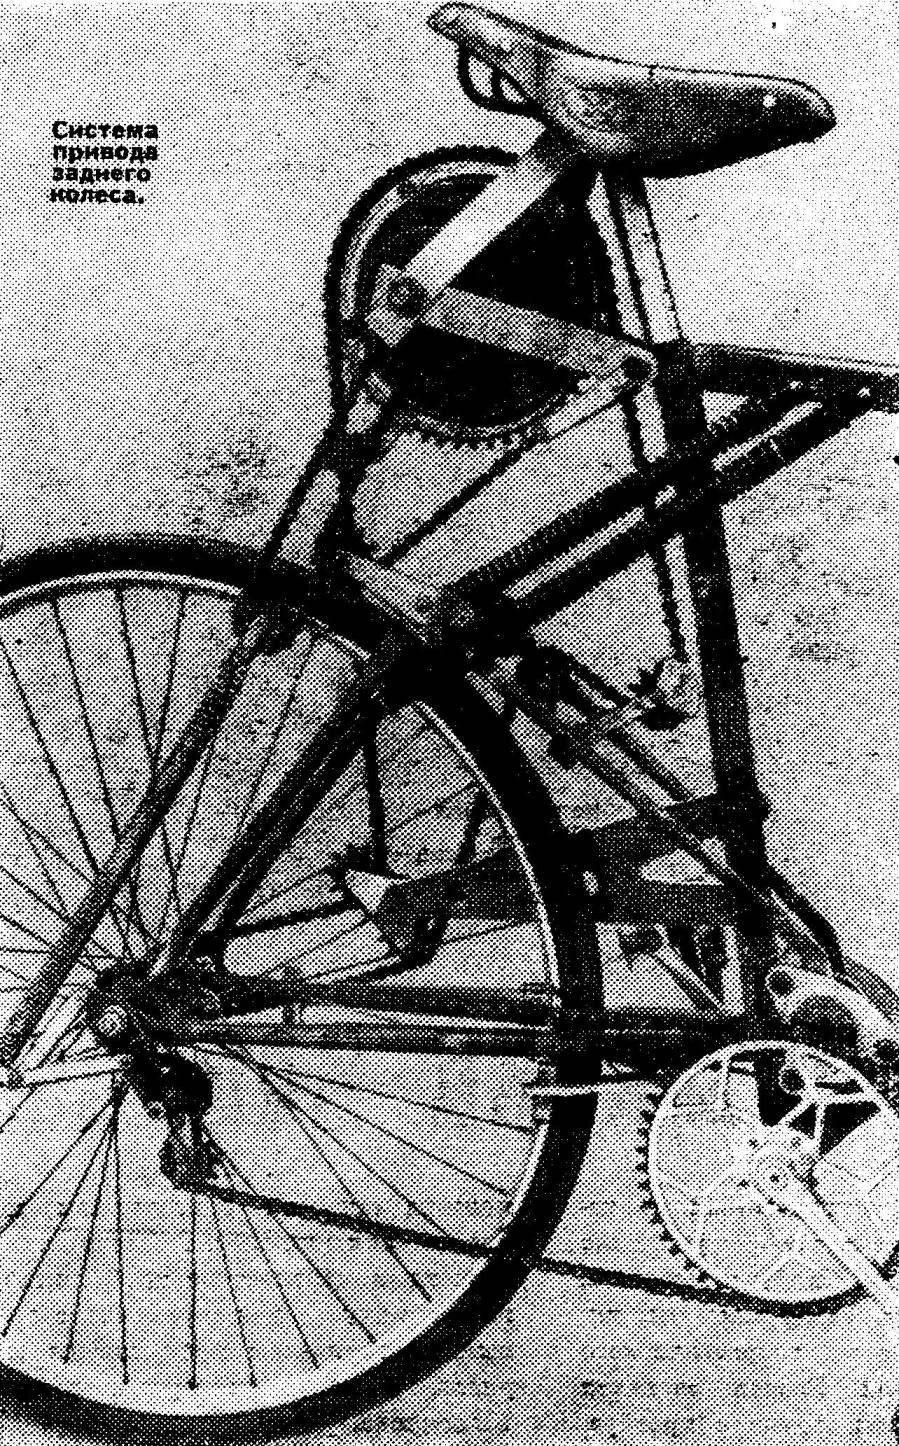 Система привода заднего колеса.